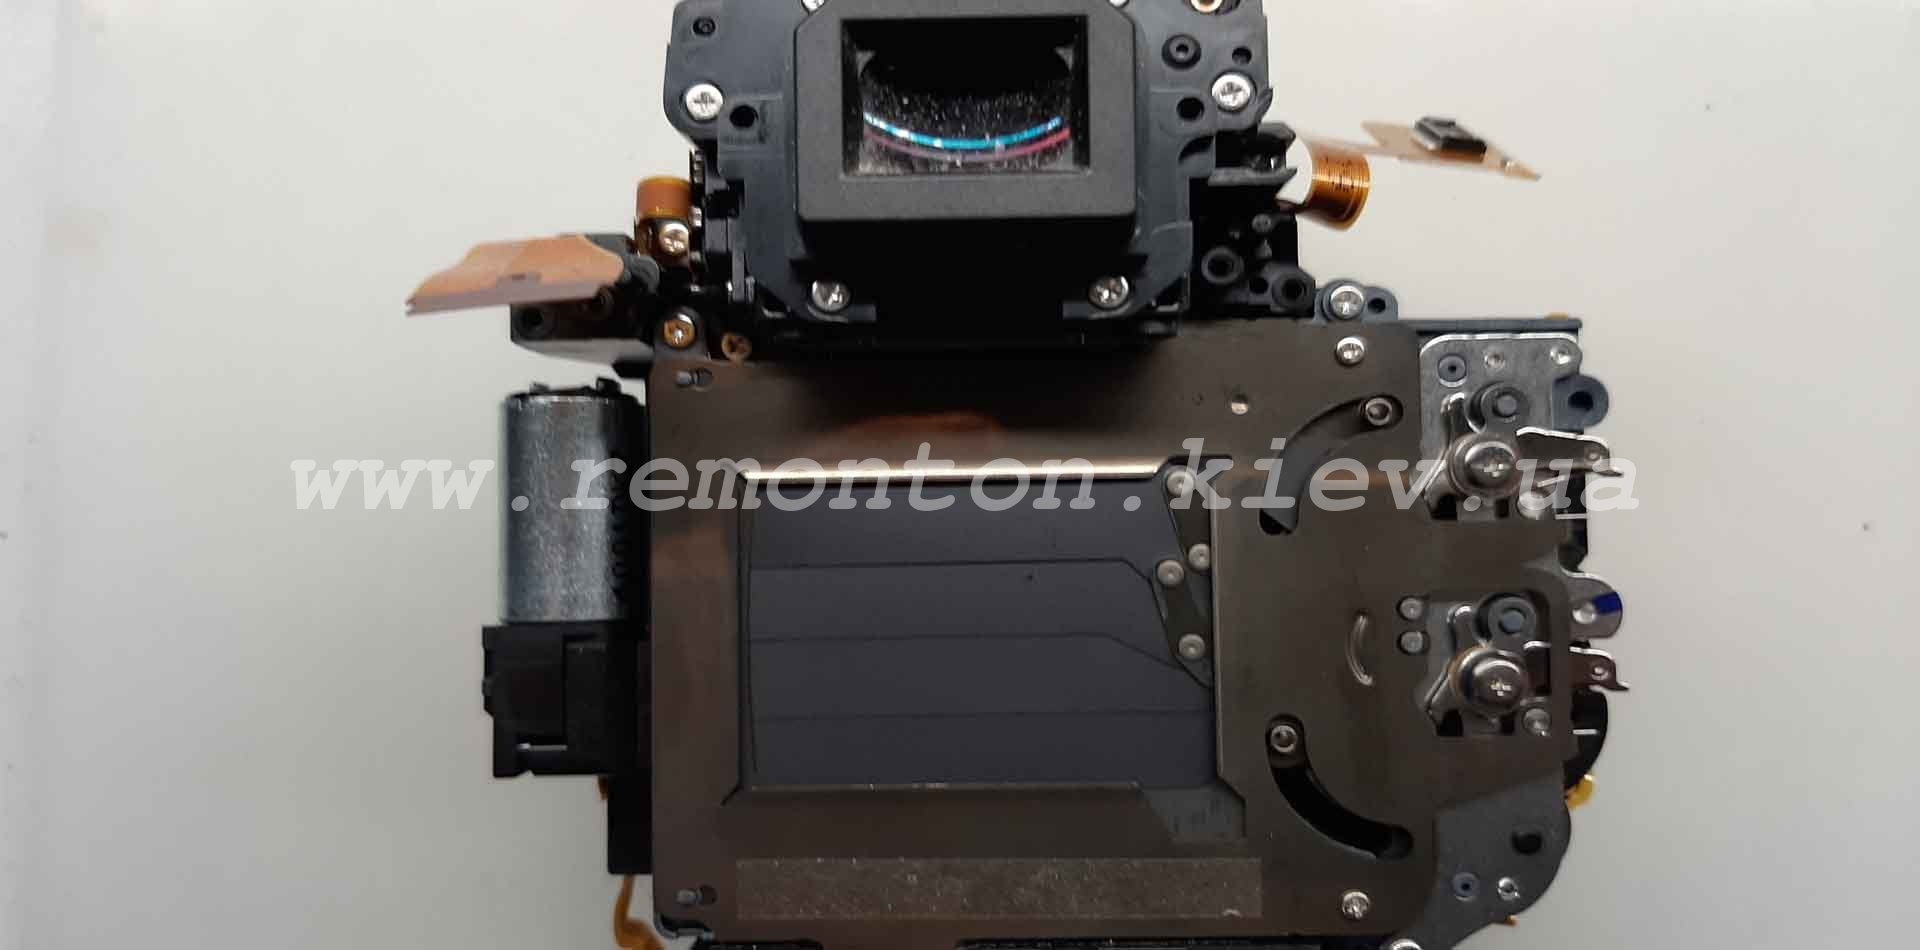 Ремонт Canon 6D -замена ламелей затвора